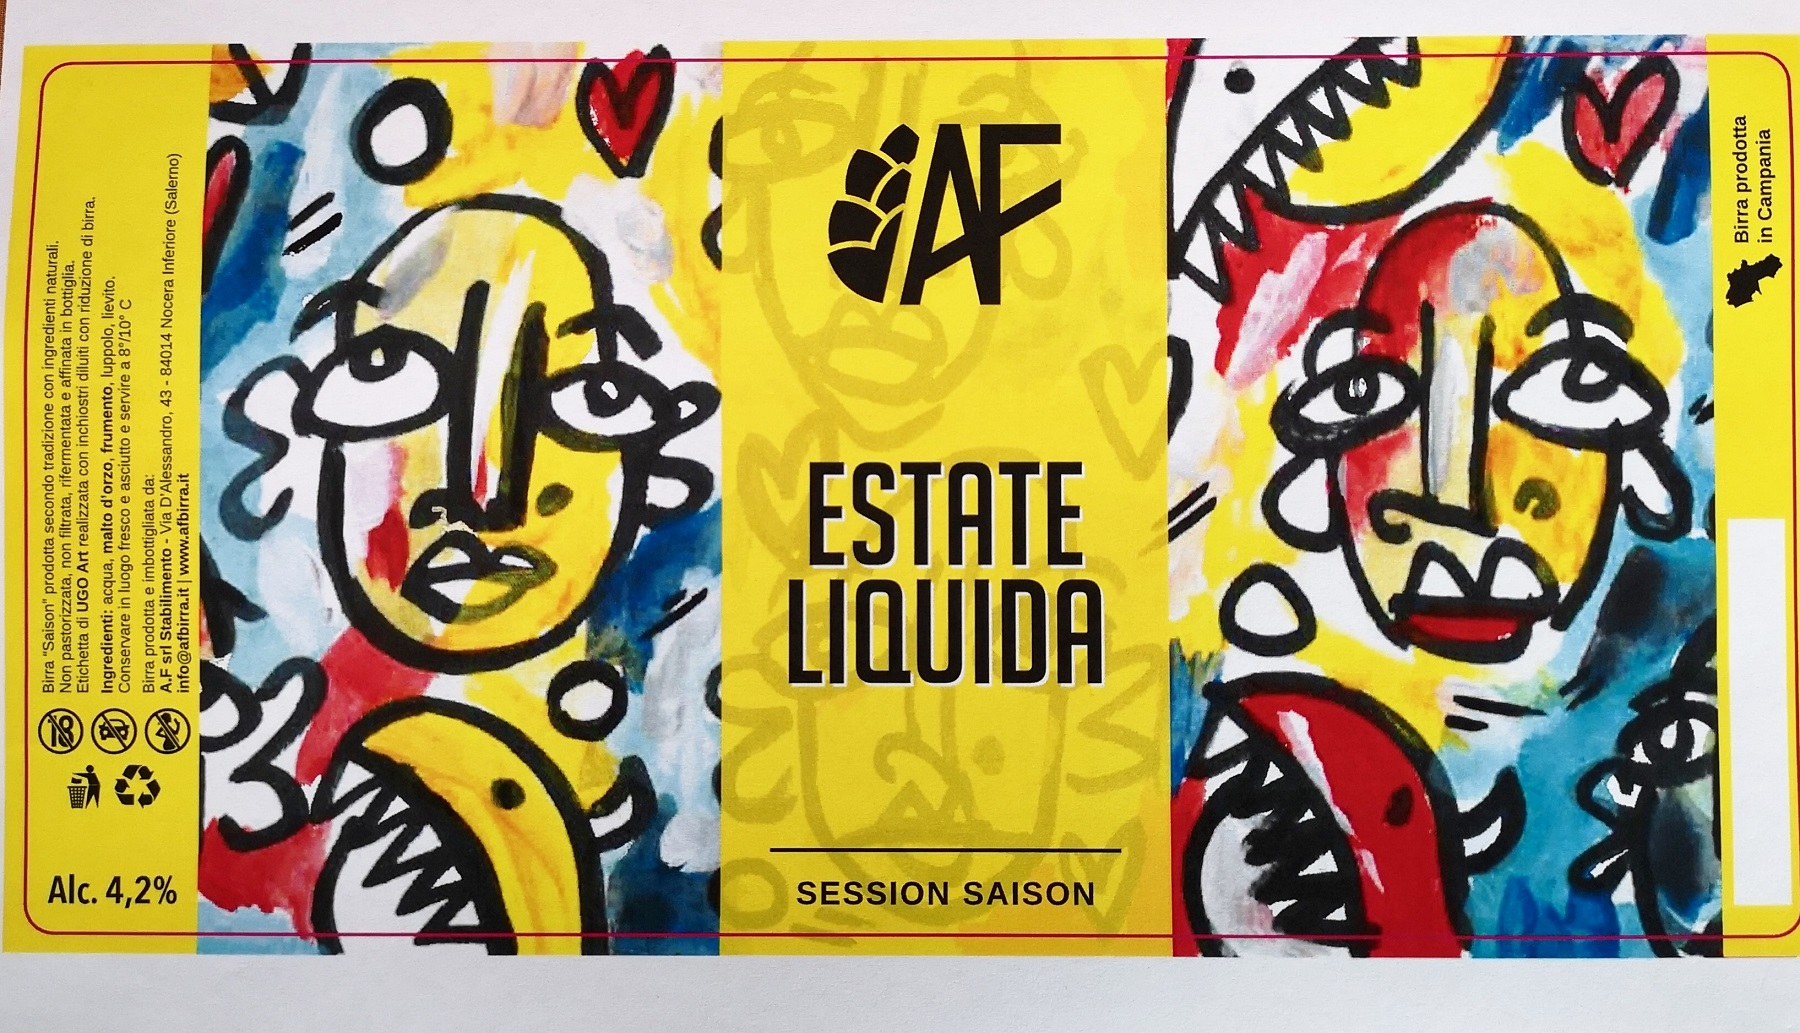 Estate Liquida, etichetta stampata